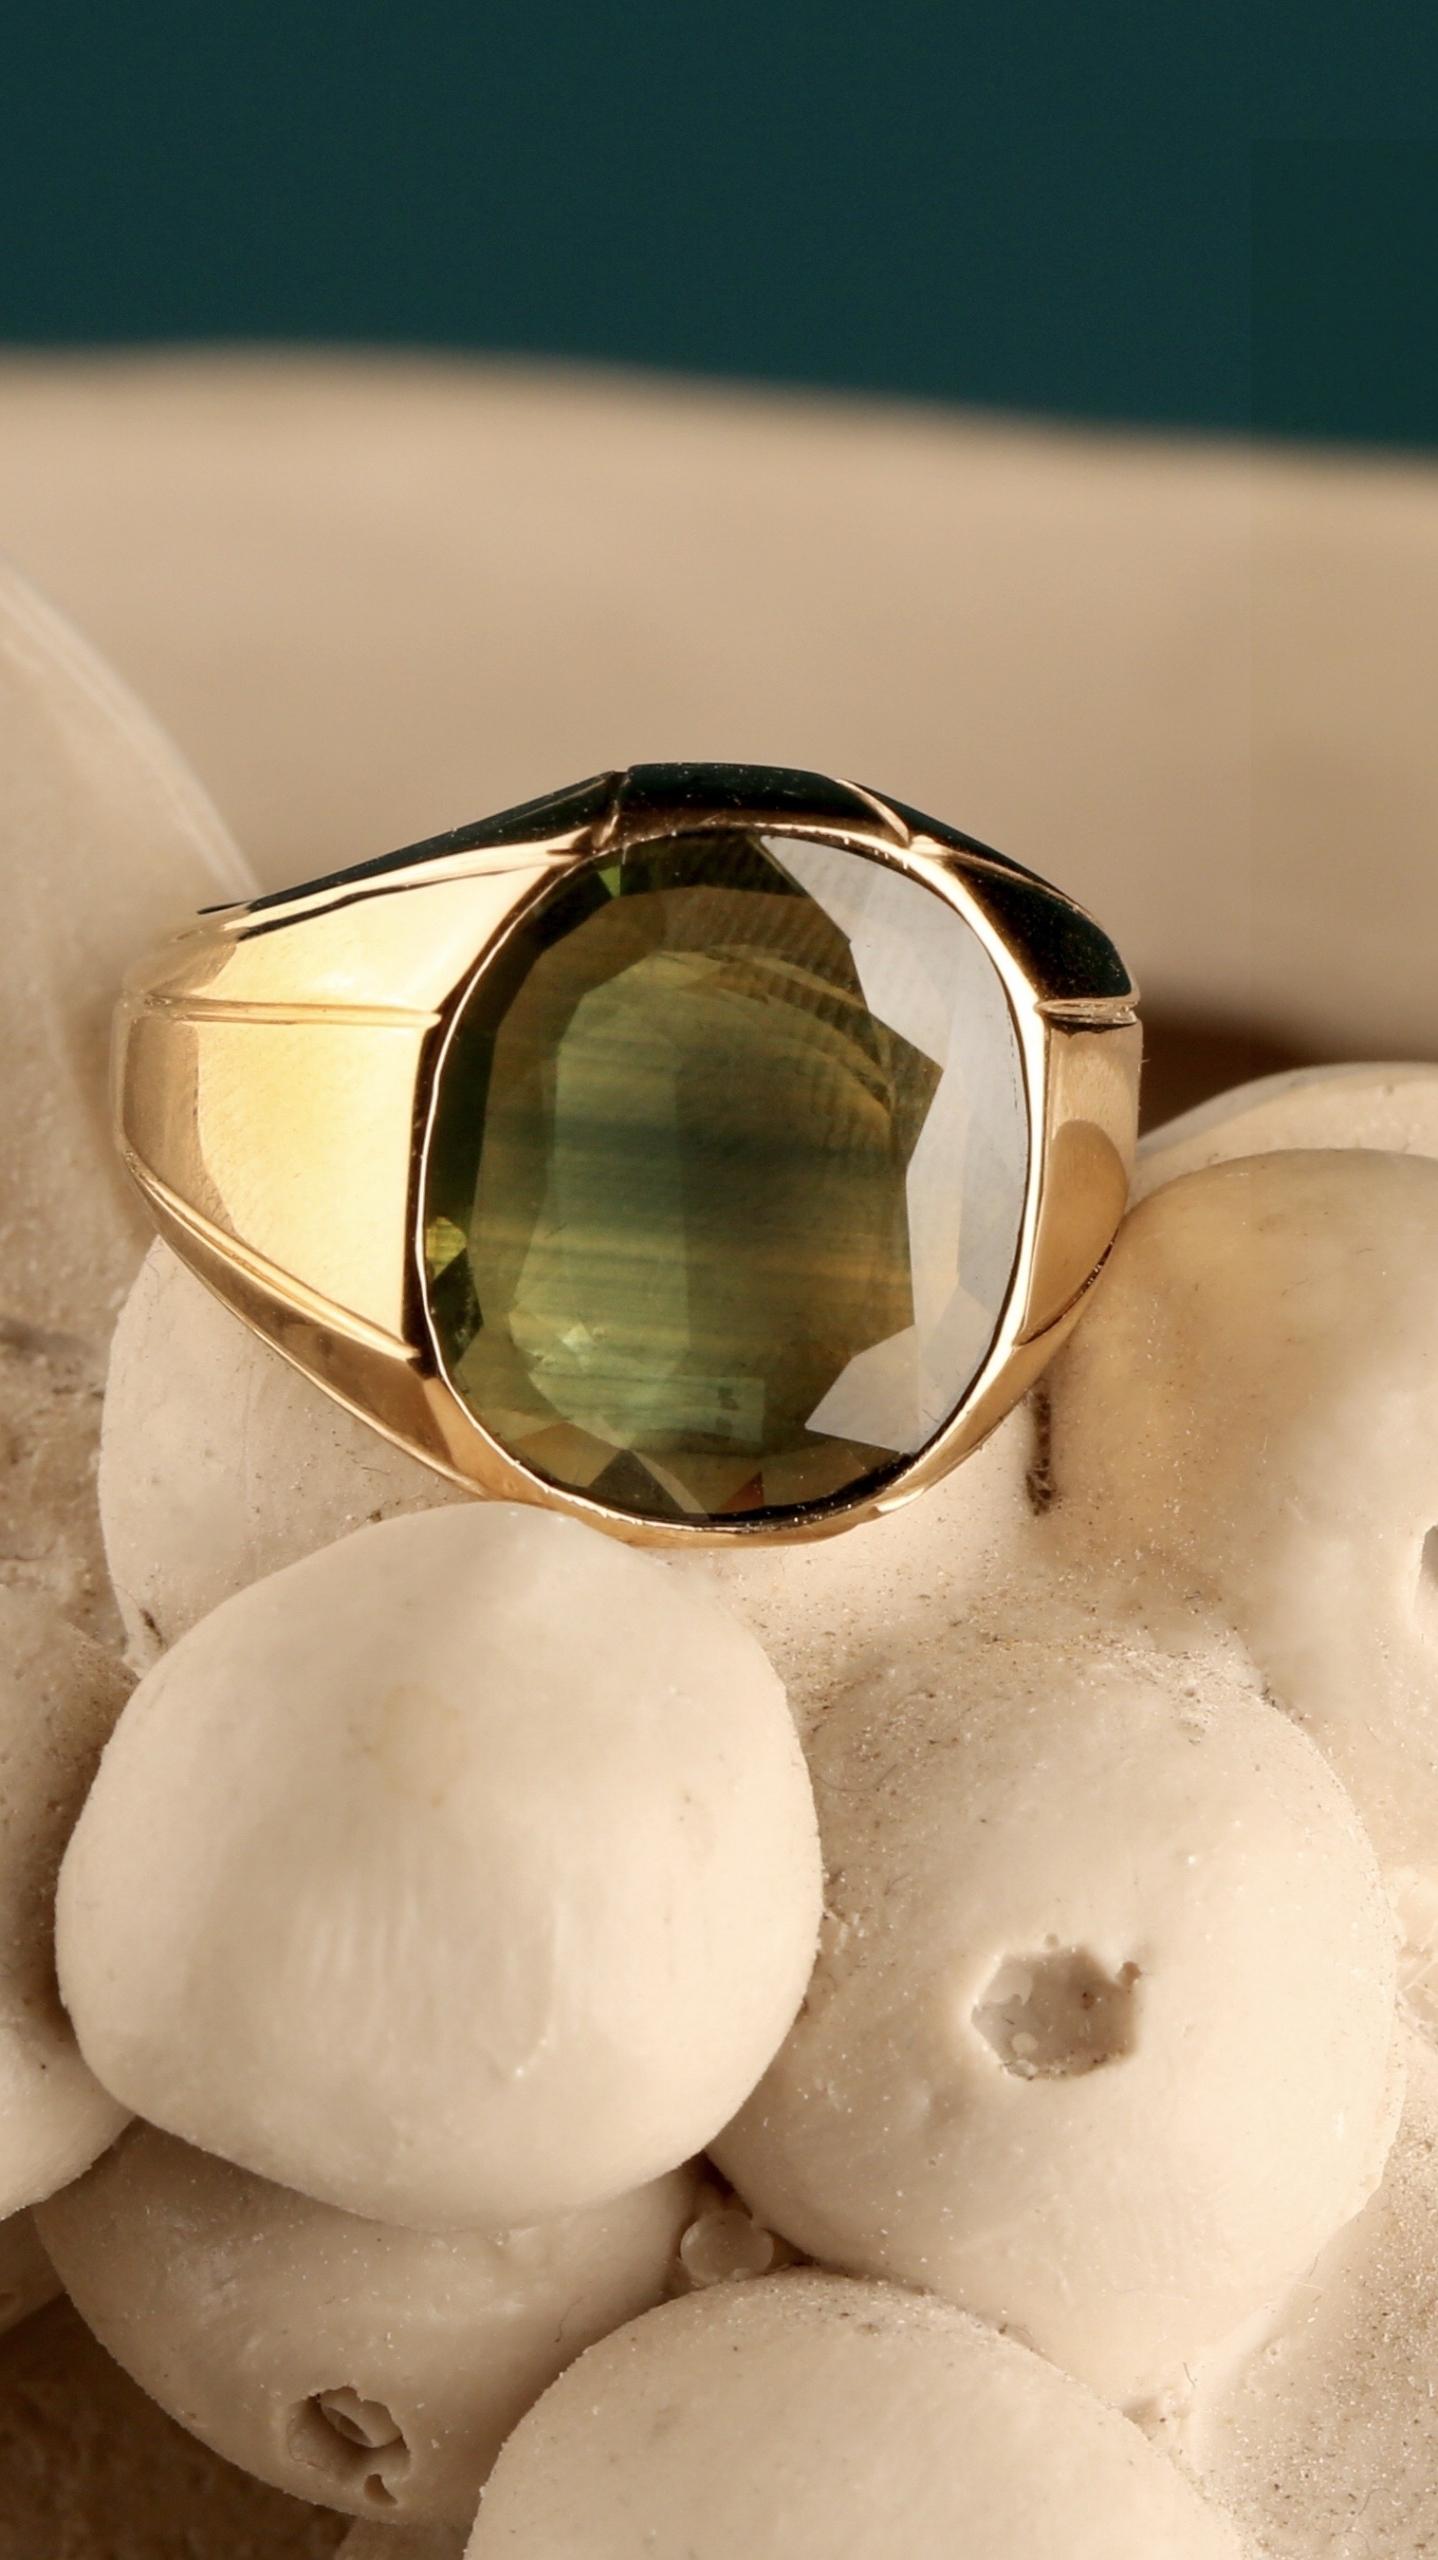 Y-81 انگشتر یاقوت سبز معدنی با پایه تمام طلای دست ساز